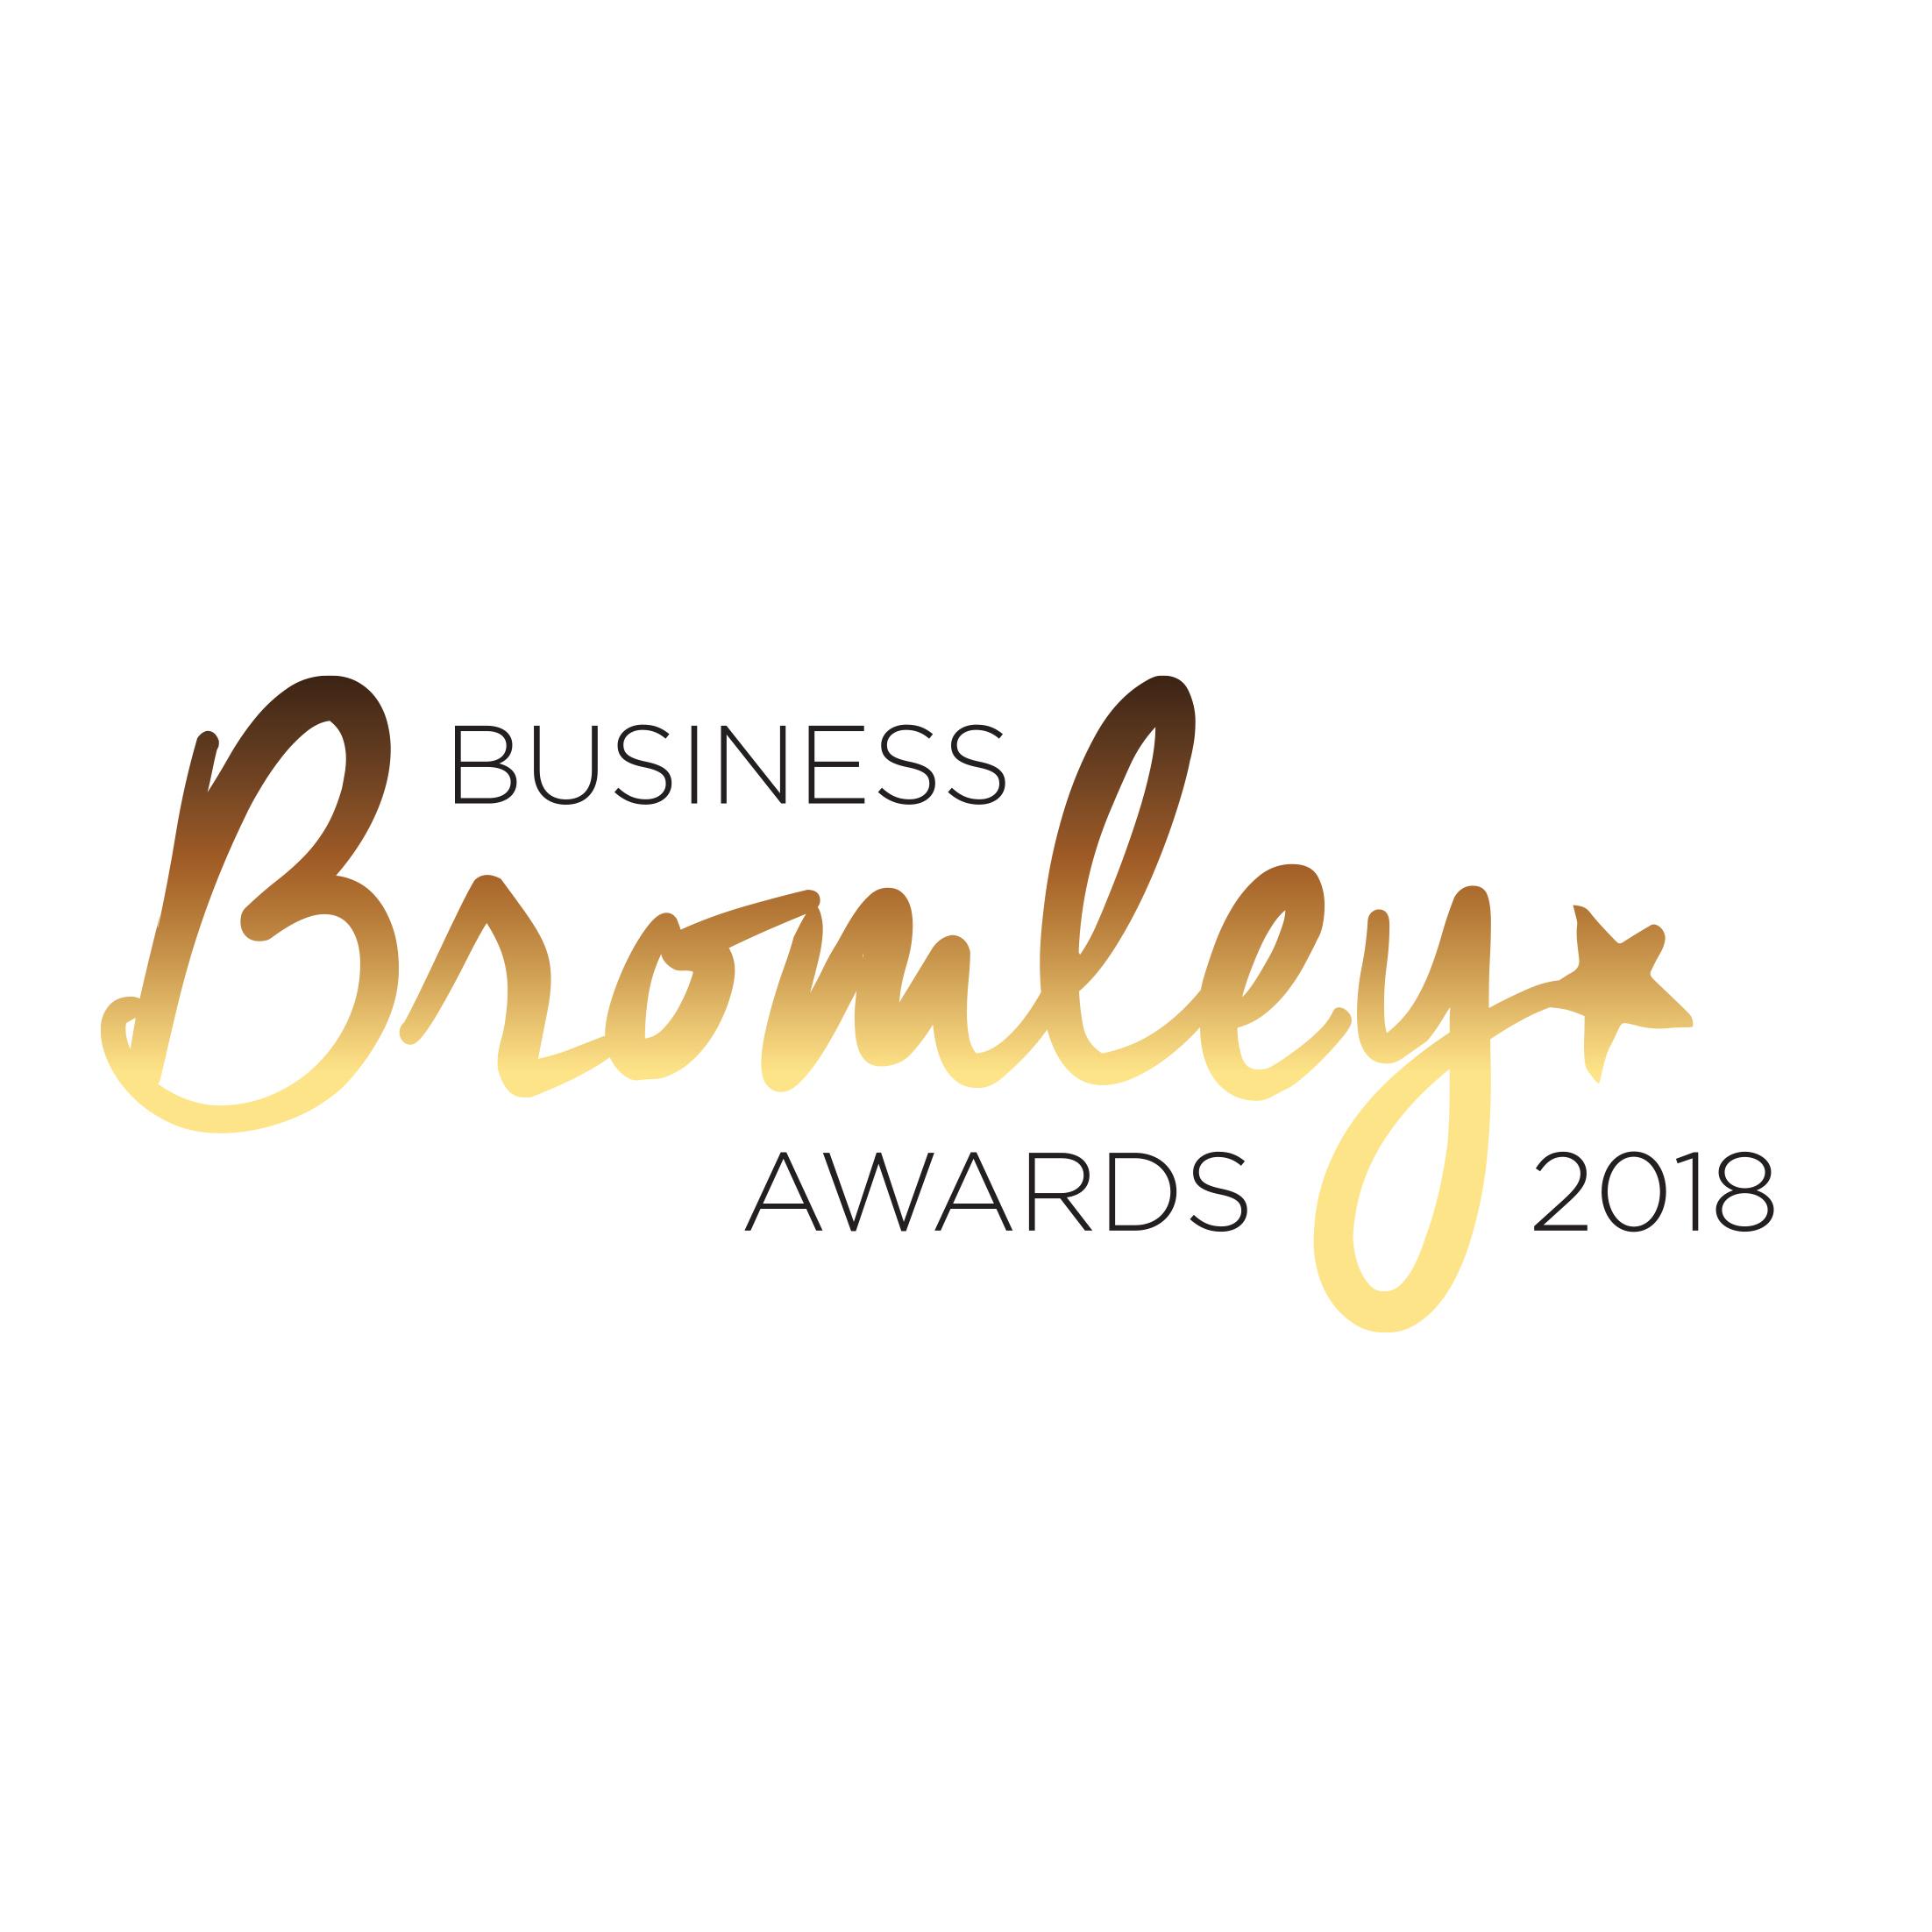 Bromley Business Awards Logo 2018 Colour SQ.jpg